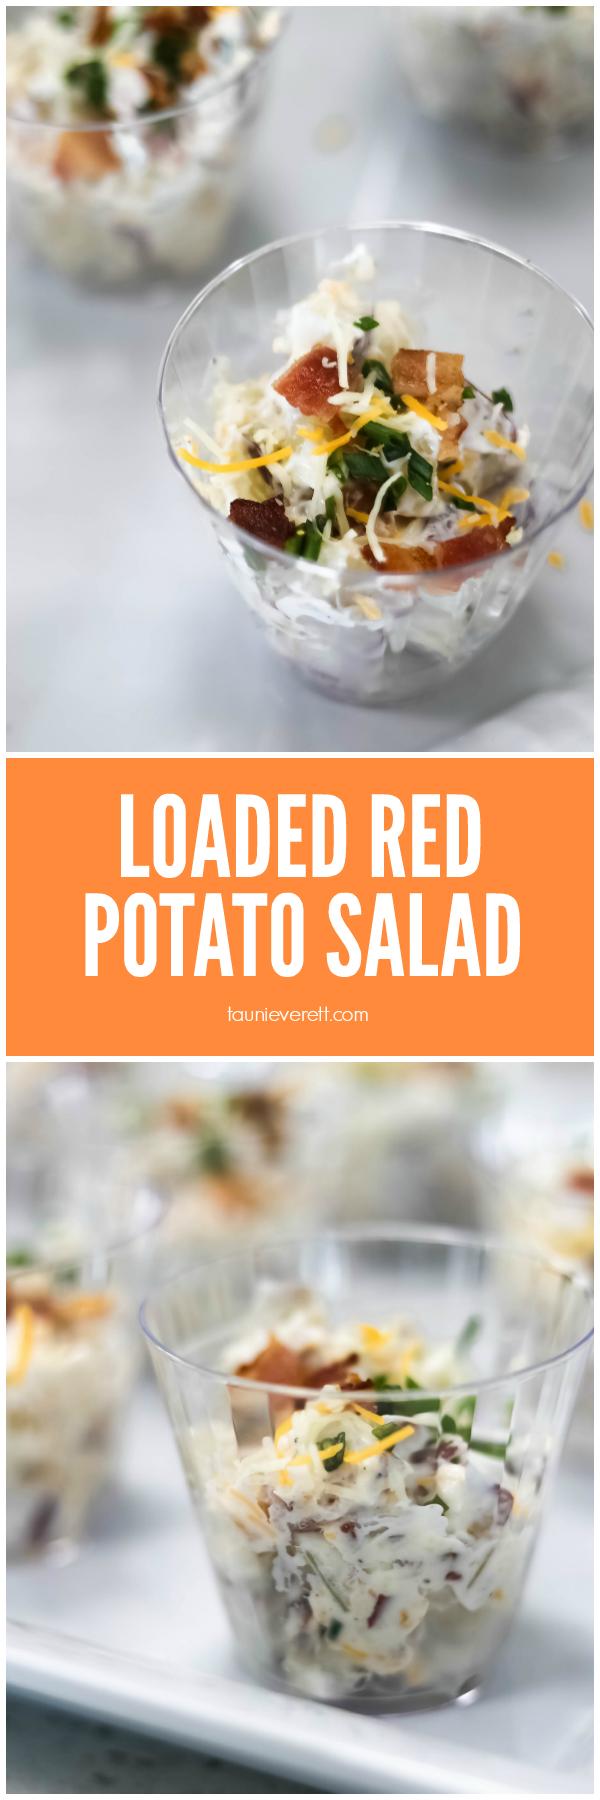 Loaded Red Potato Salad Recipe. Perfect for a picnic or bbq. #potatosalad #picnic #bbq #salad